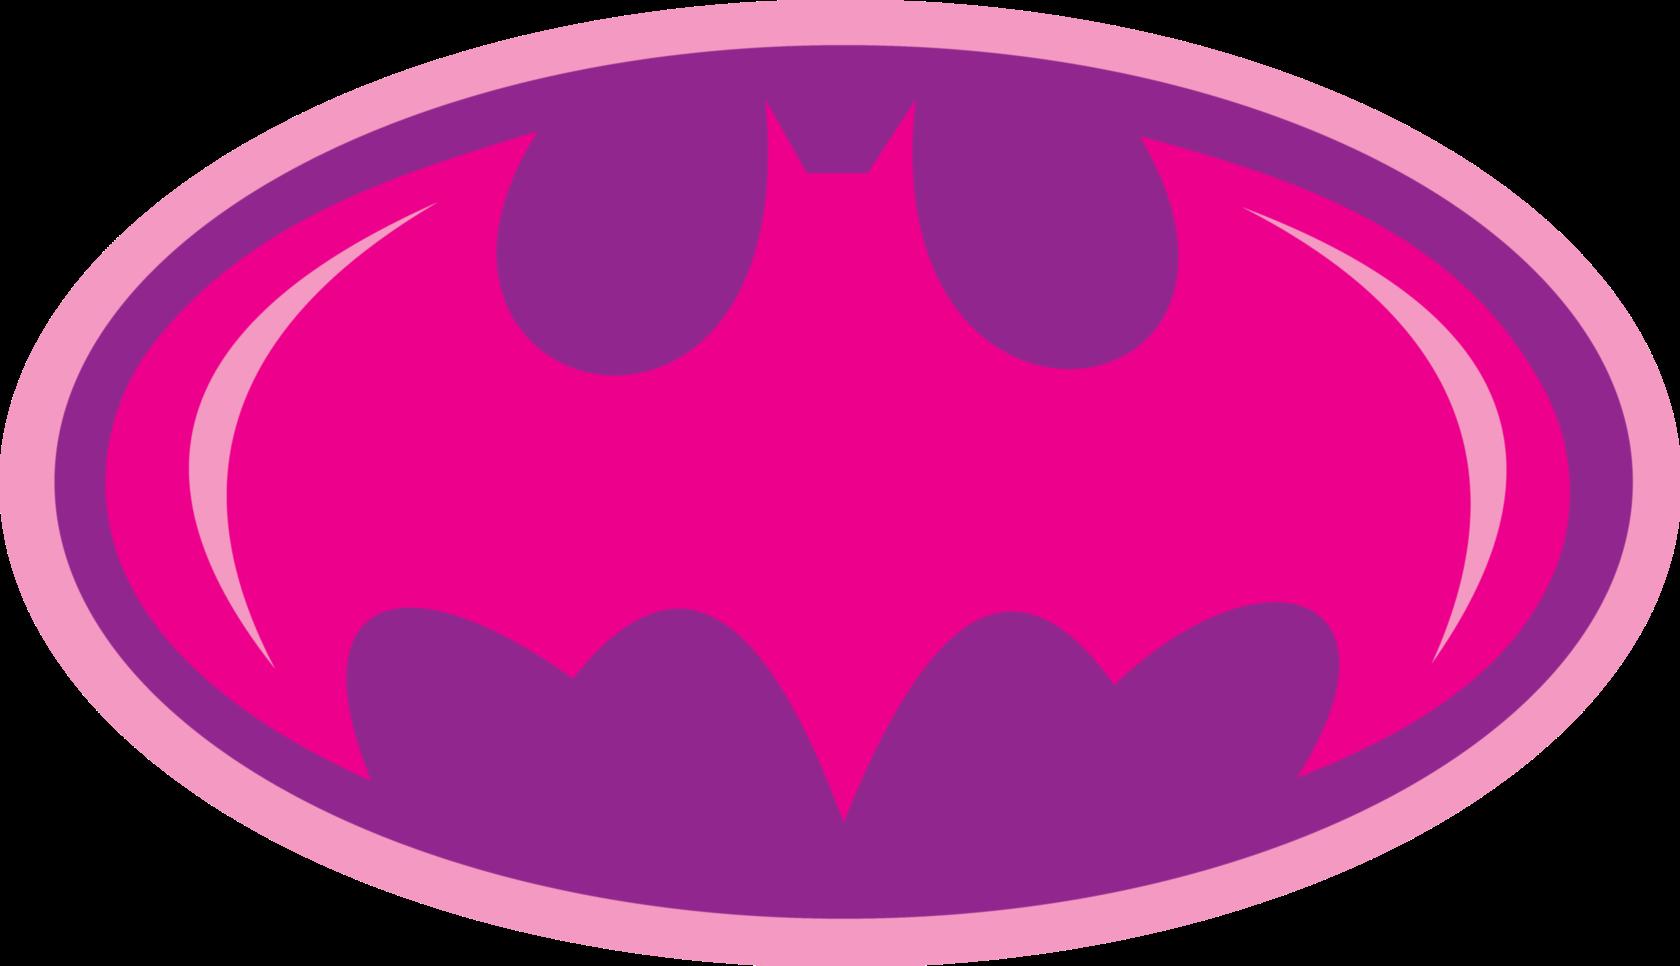 Lip clipart girly. Pink purple batman batgirl